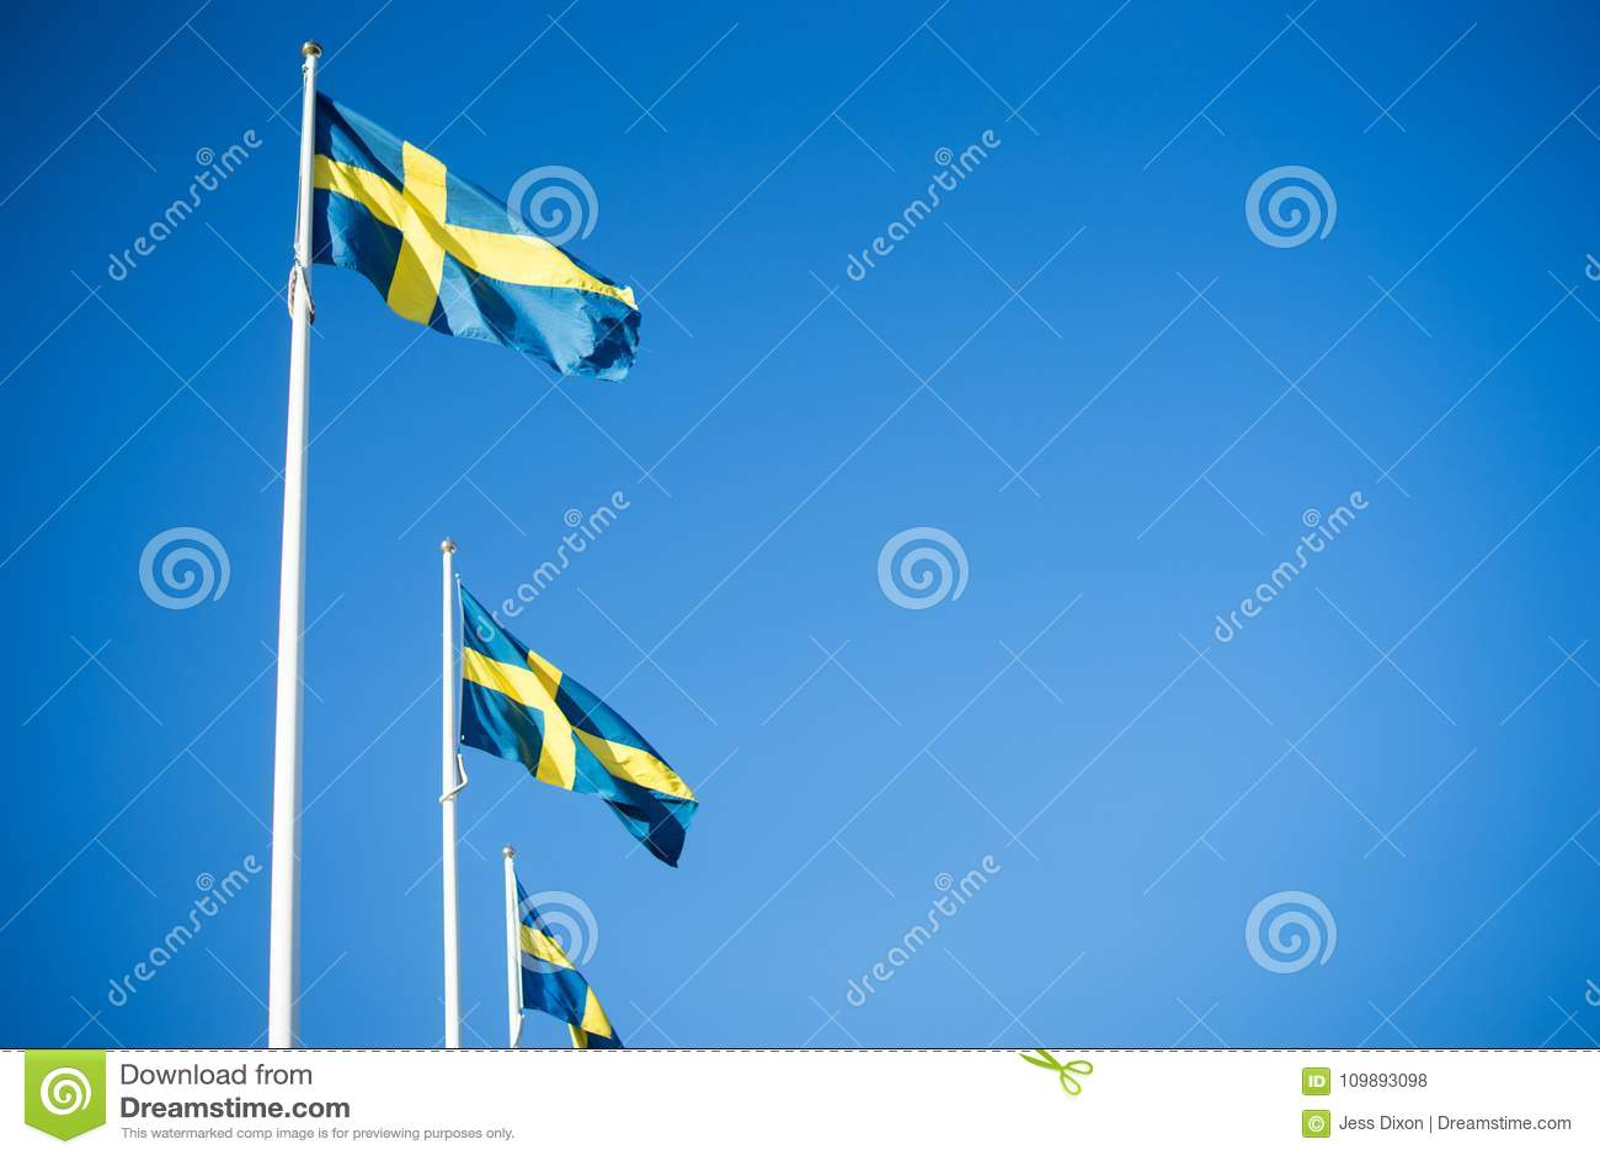 Swedish Flags in clear blue sky - Gothenburg, Sweden